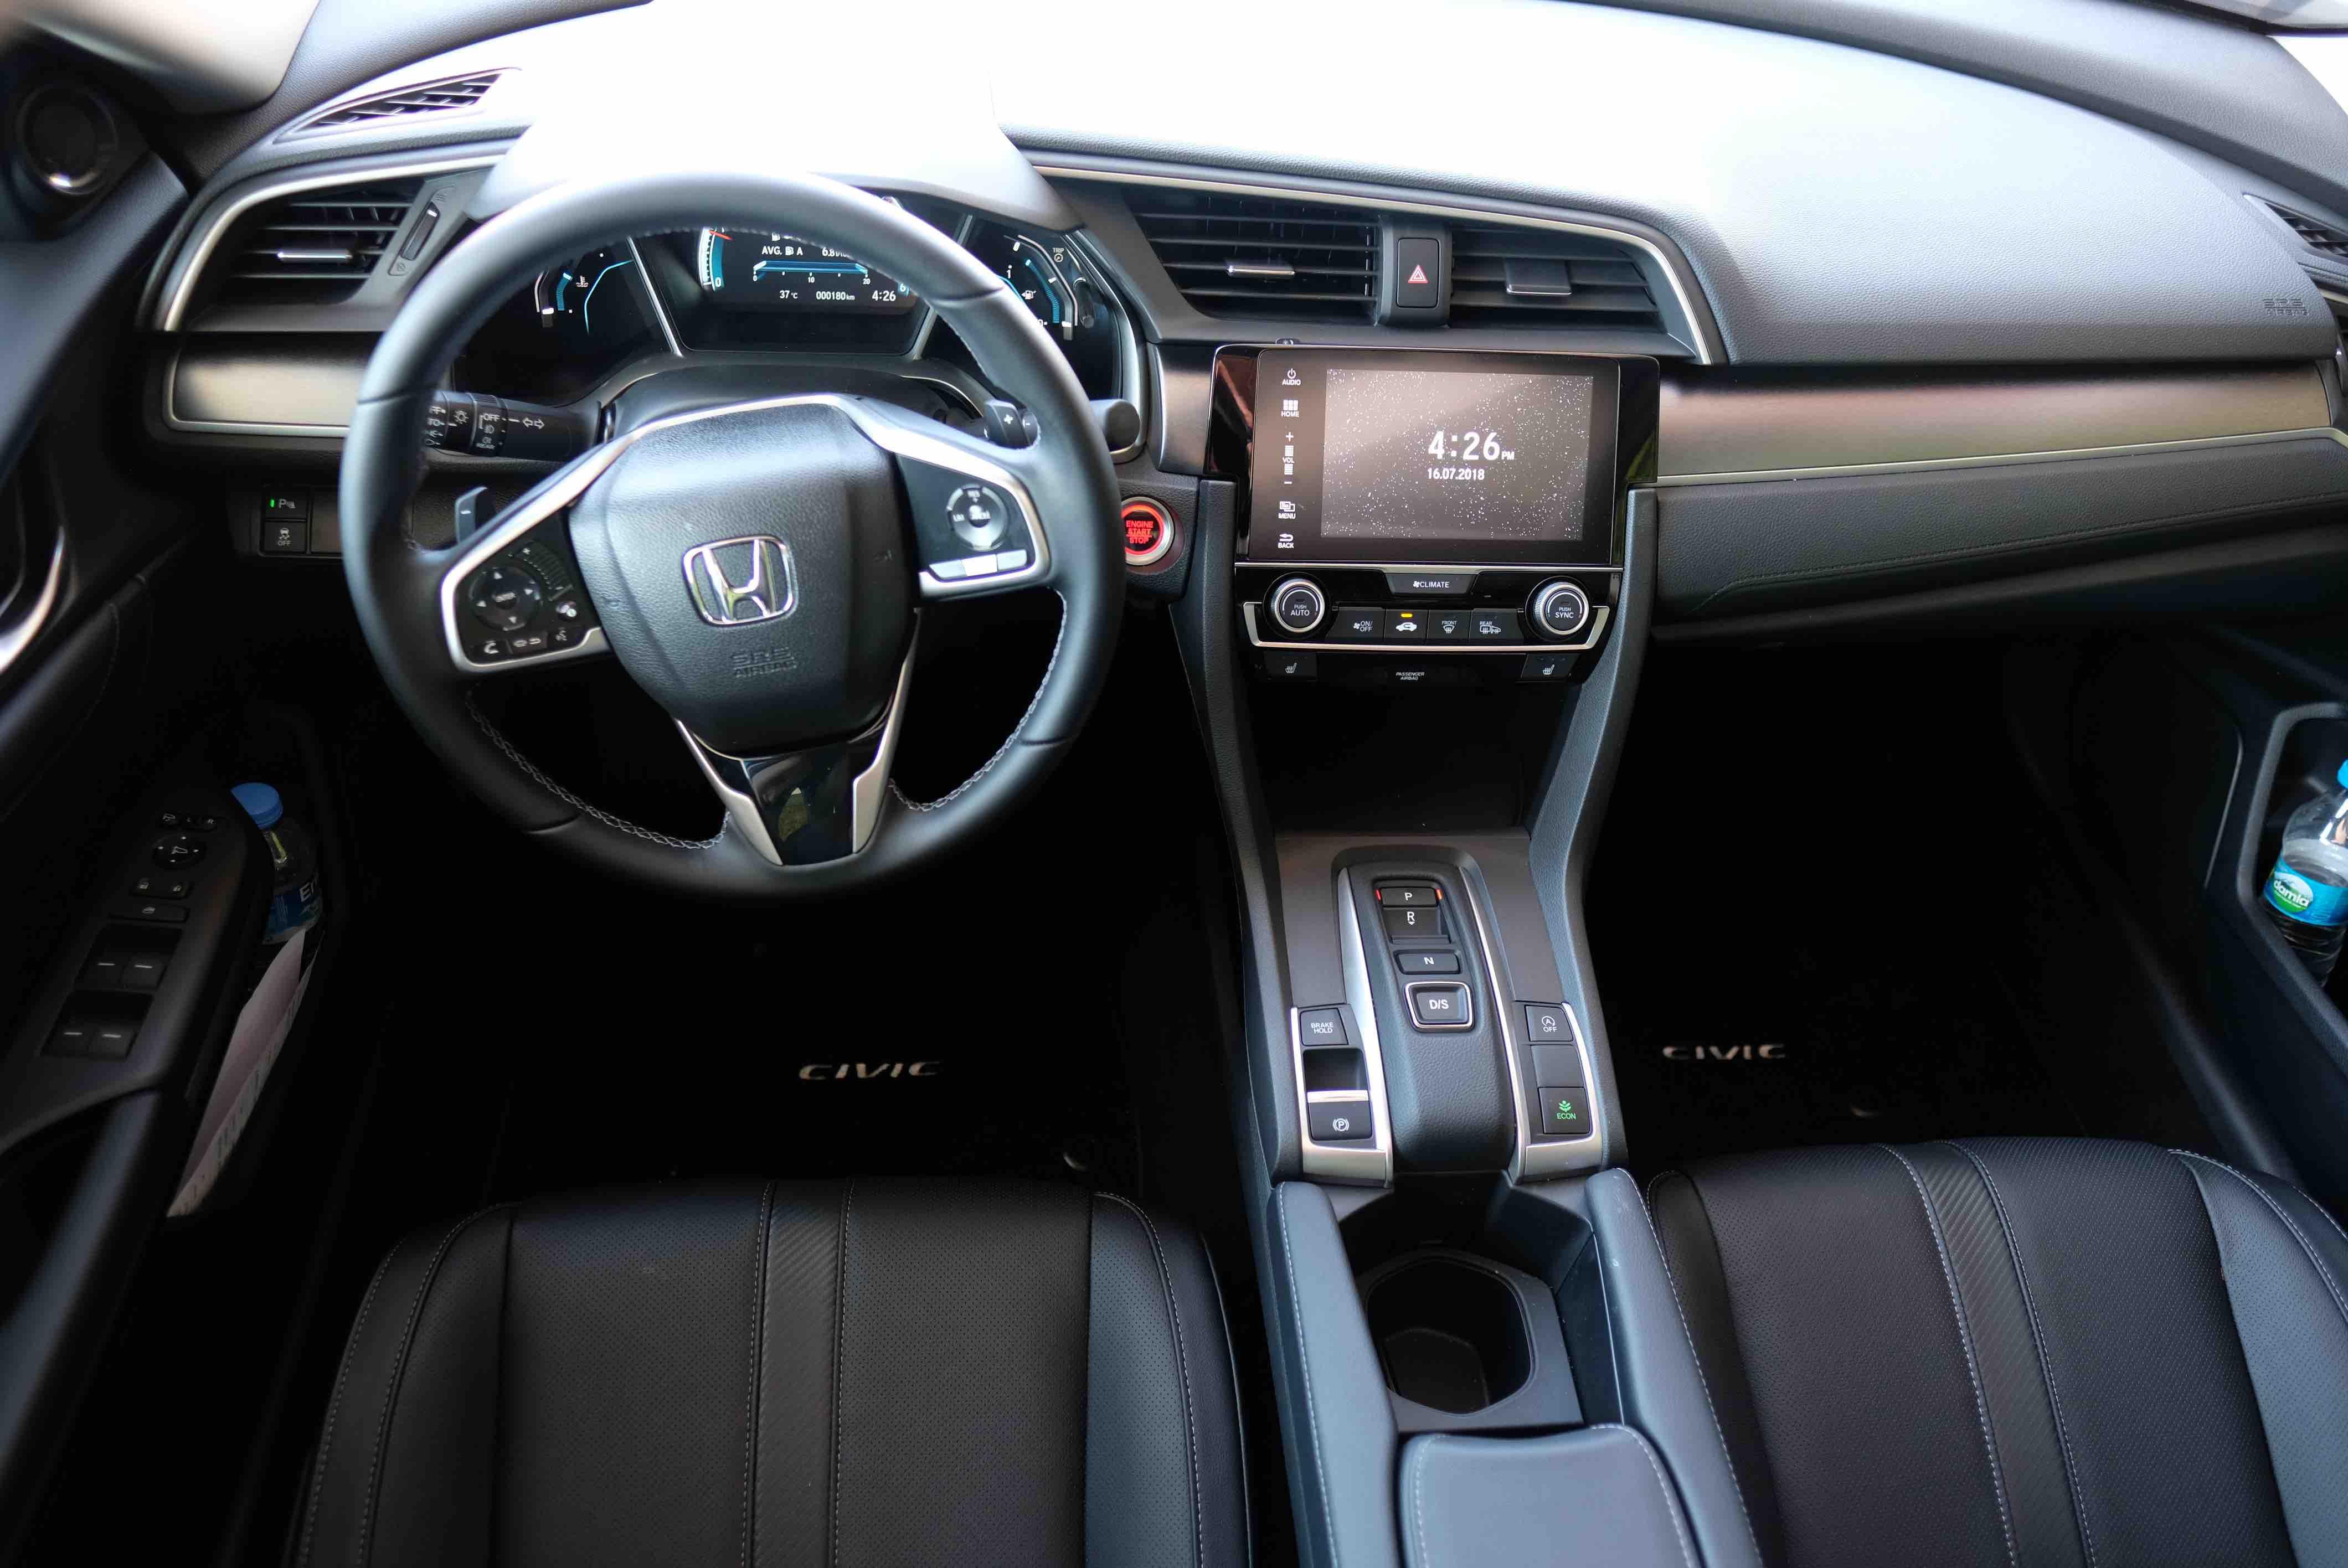 Honda Civic Sedan Dizel Otomatik Kaç Lira Otomobil Gazetesi